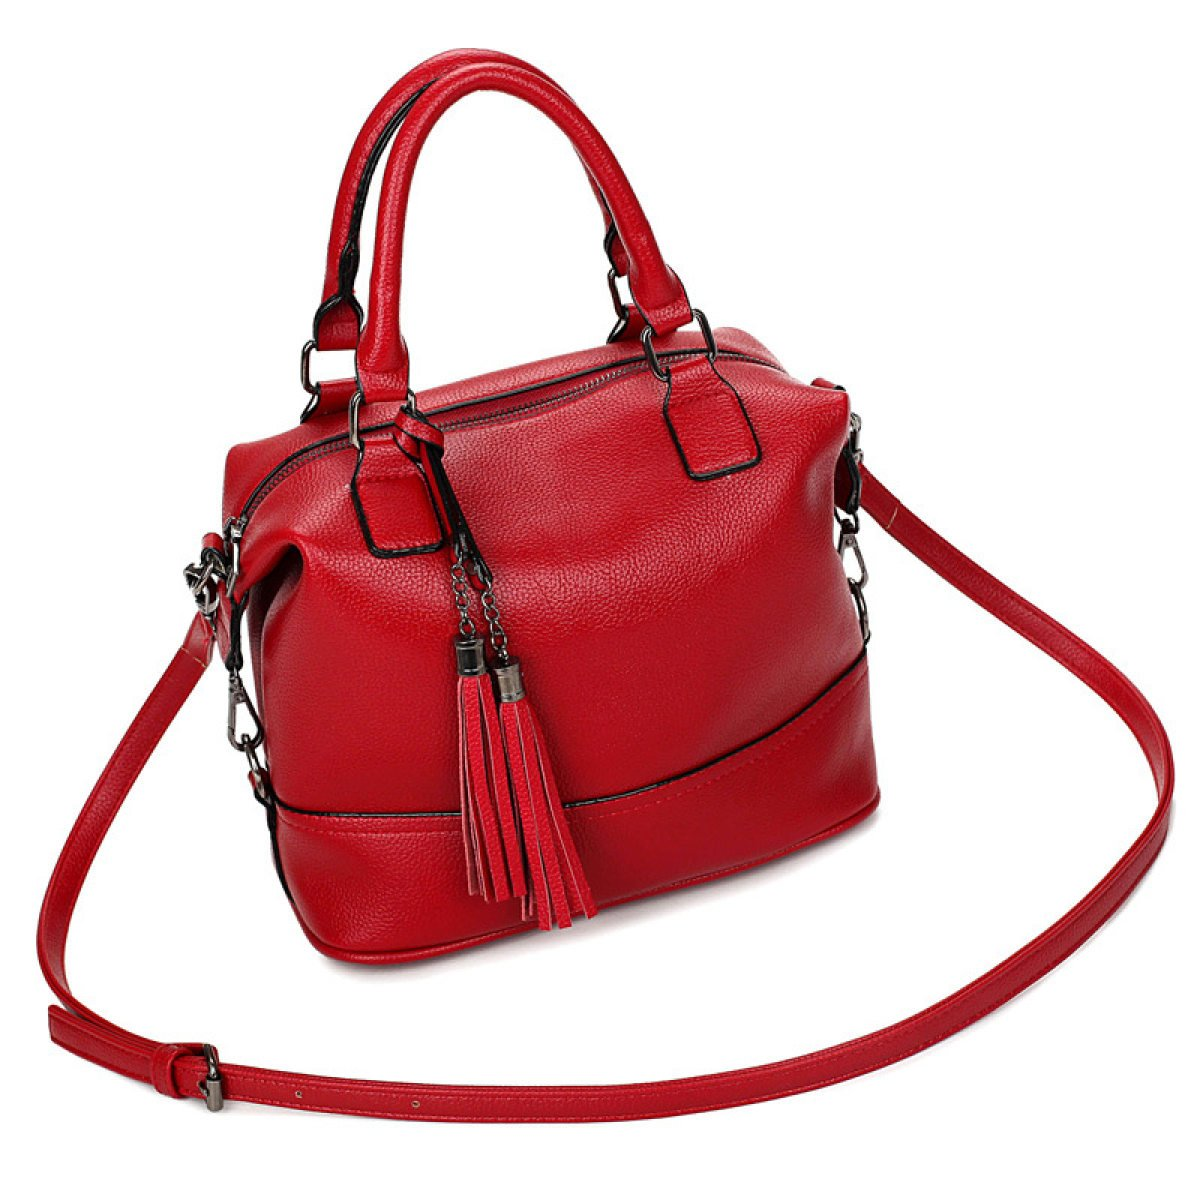 Generic Mujer Vintage–Bolsas de hombro de piel bolso de mano modelo, LakeBlue SCFGGcompany